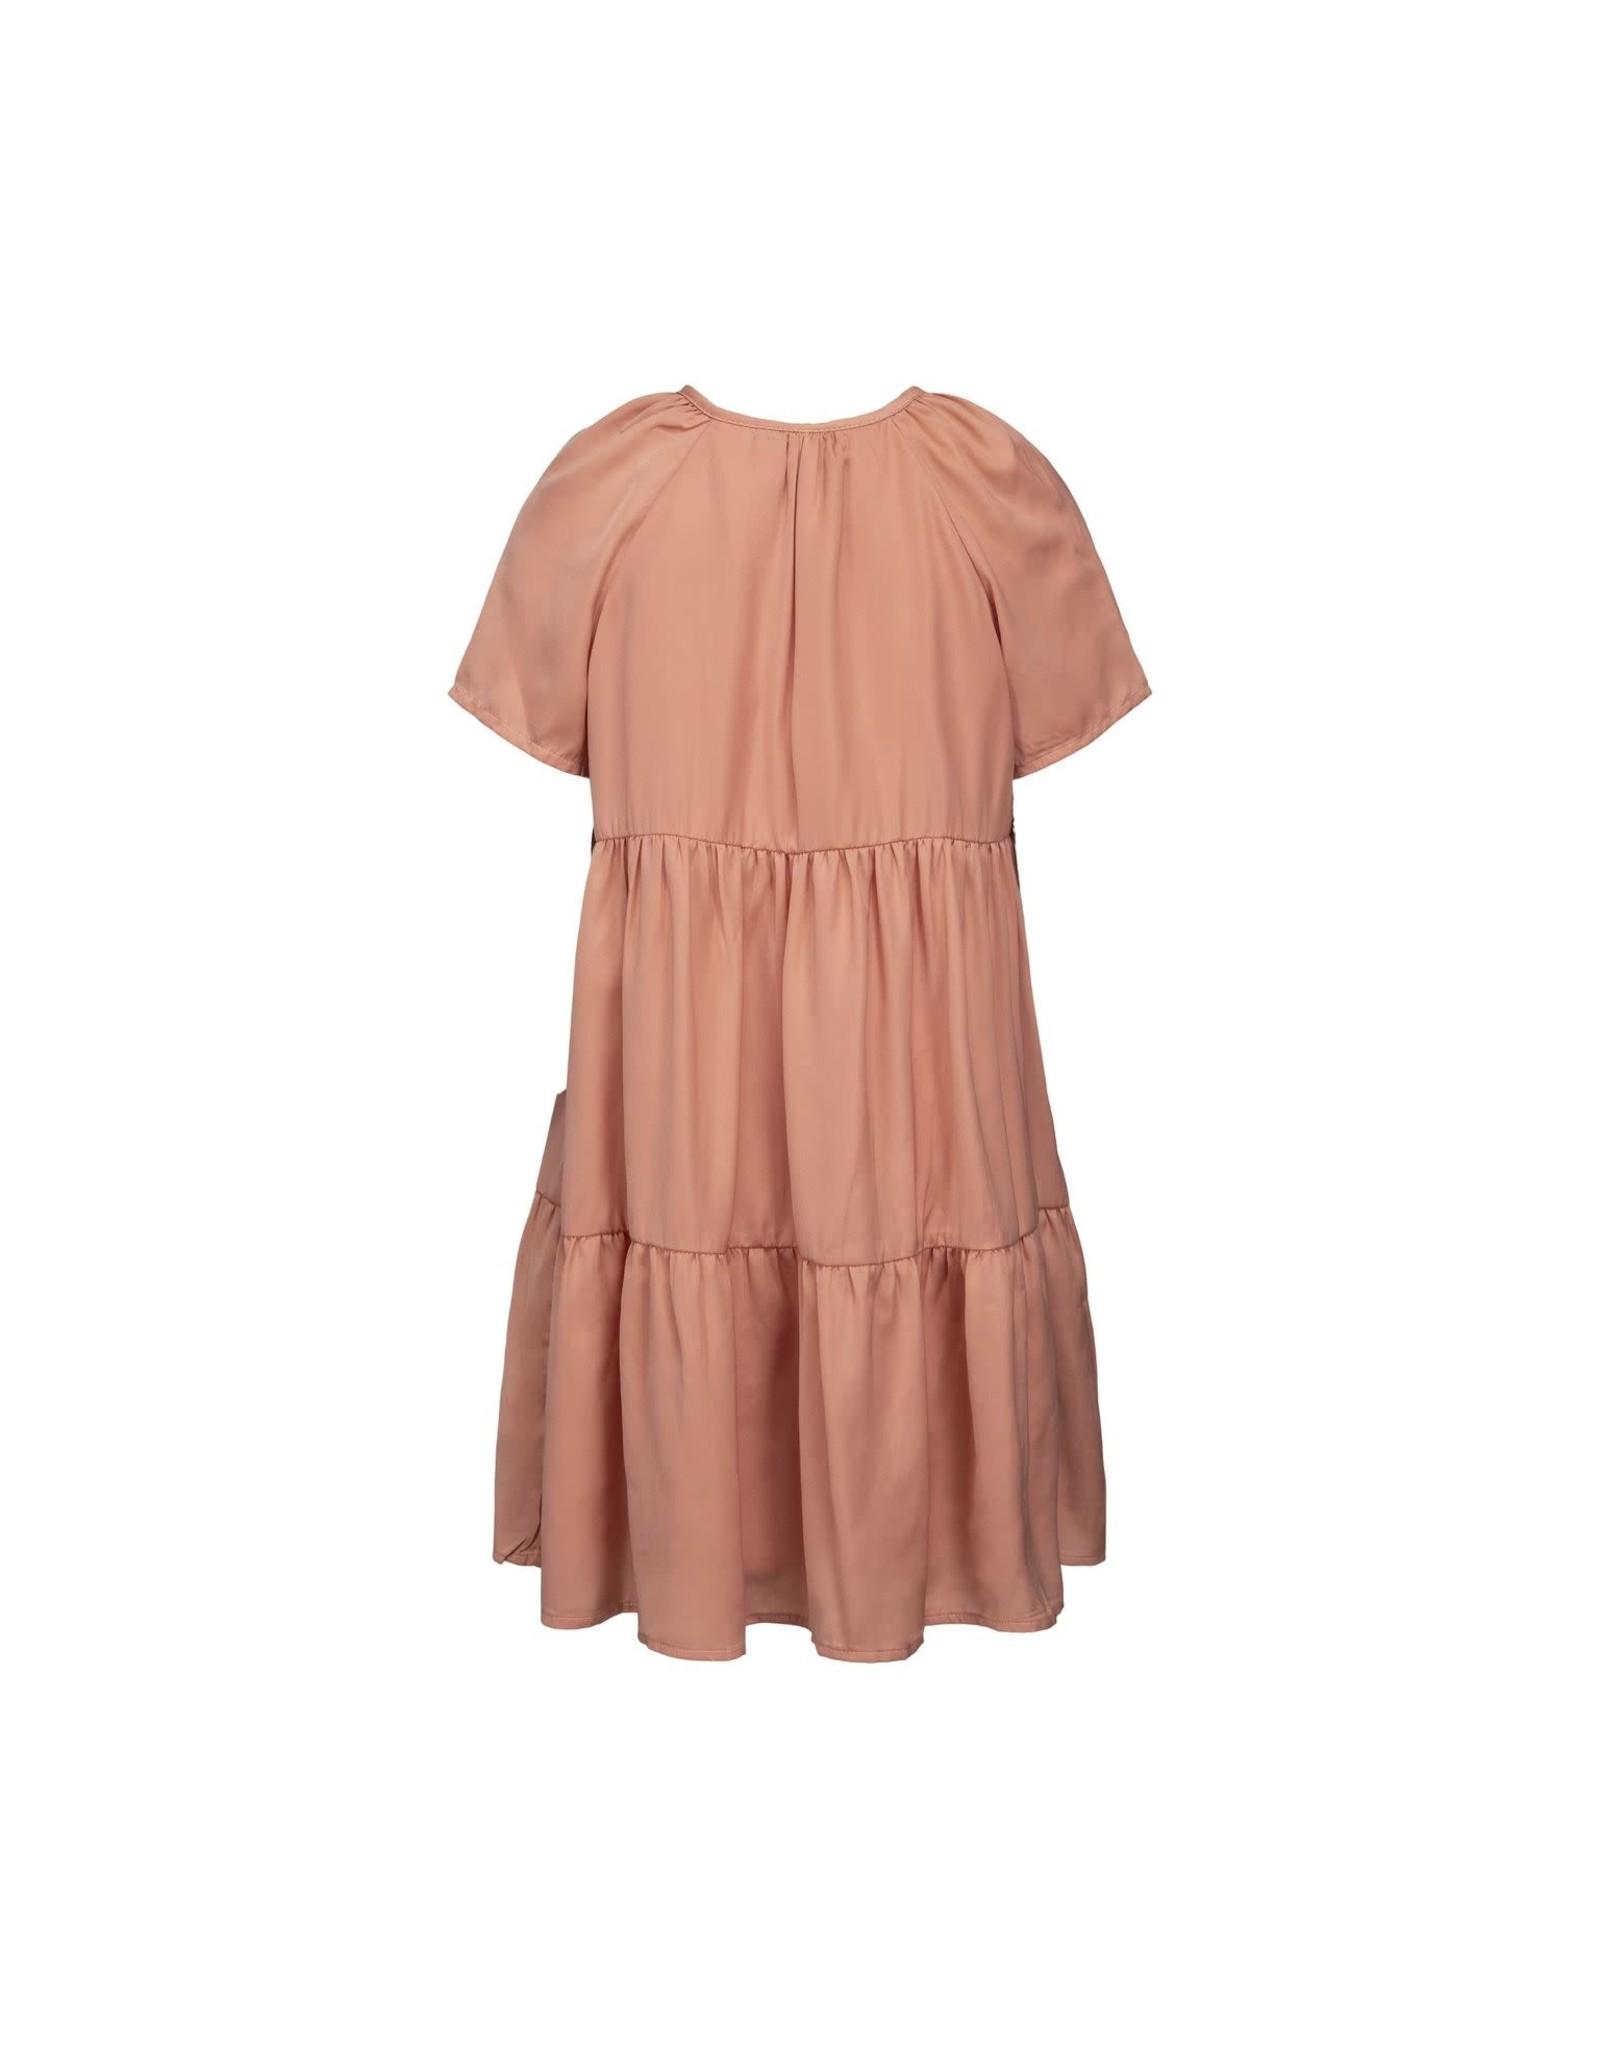 Petit by Sofie Schnoor dress dusty rose